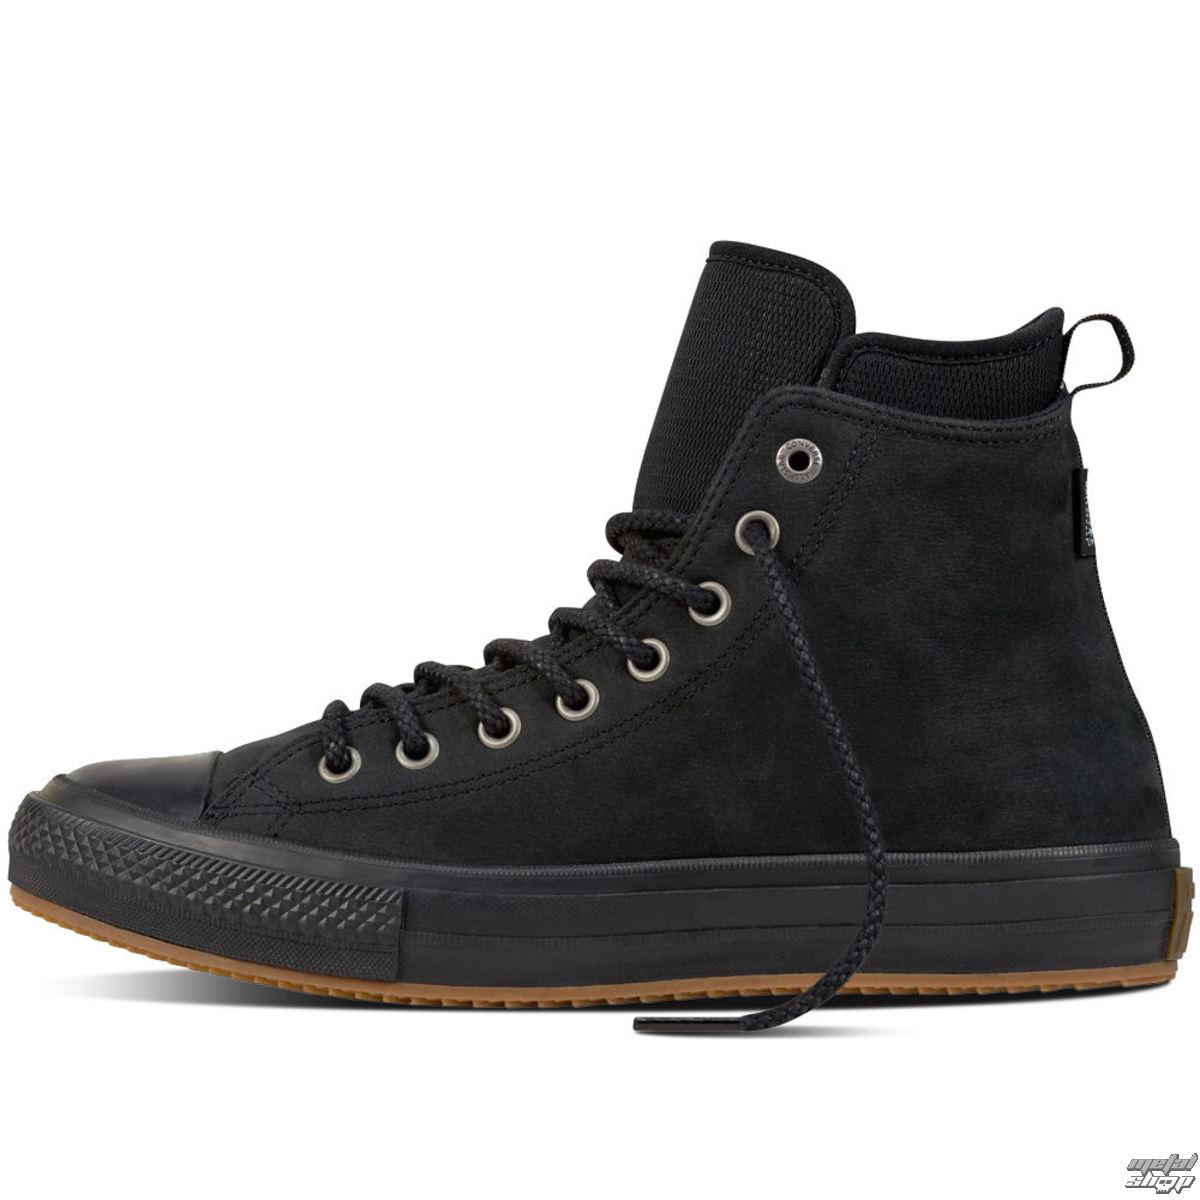 6b8336db7cc6 topánky zimný CONVERSE - Chuck Taylor WP - C157460 - metalshop.sk